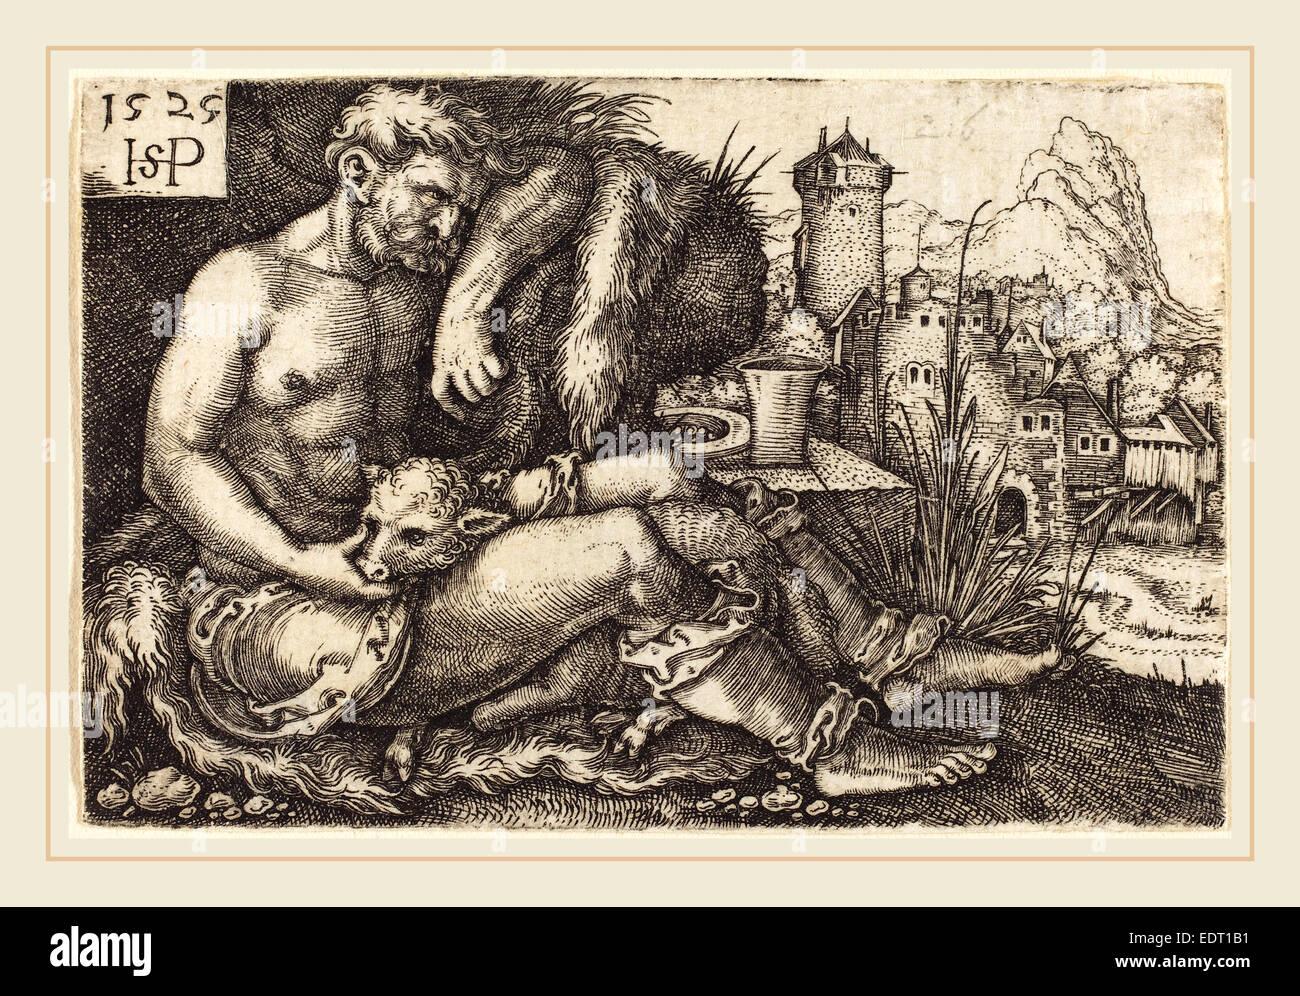 Sebald Beham (German, 1500-1550), The Shepherd, 1525, engraving - Stock Image